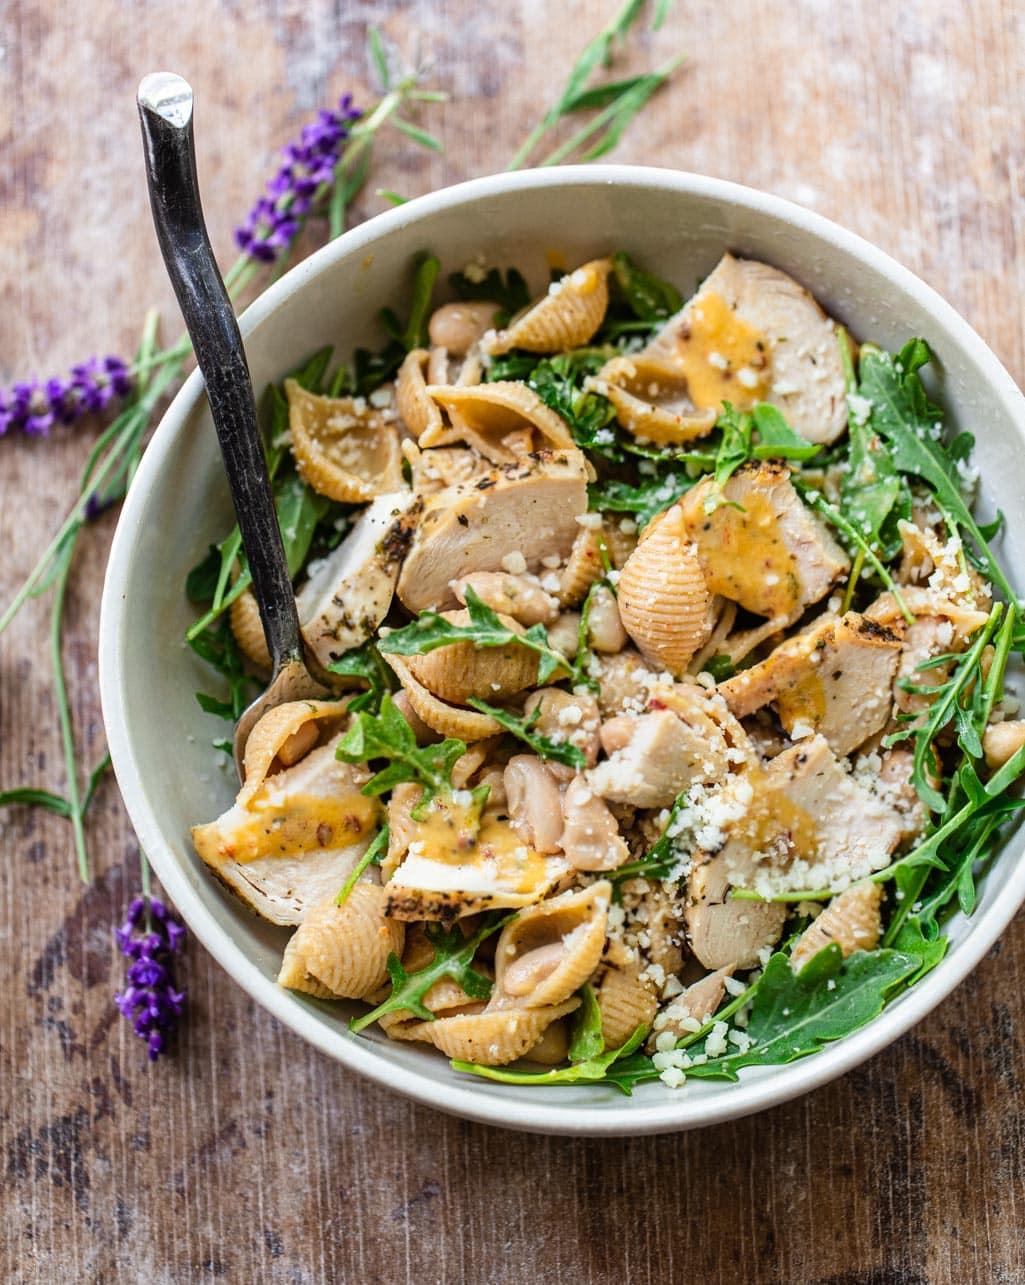 Dijon Chicken Pasta Salad with Herbs de Provence